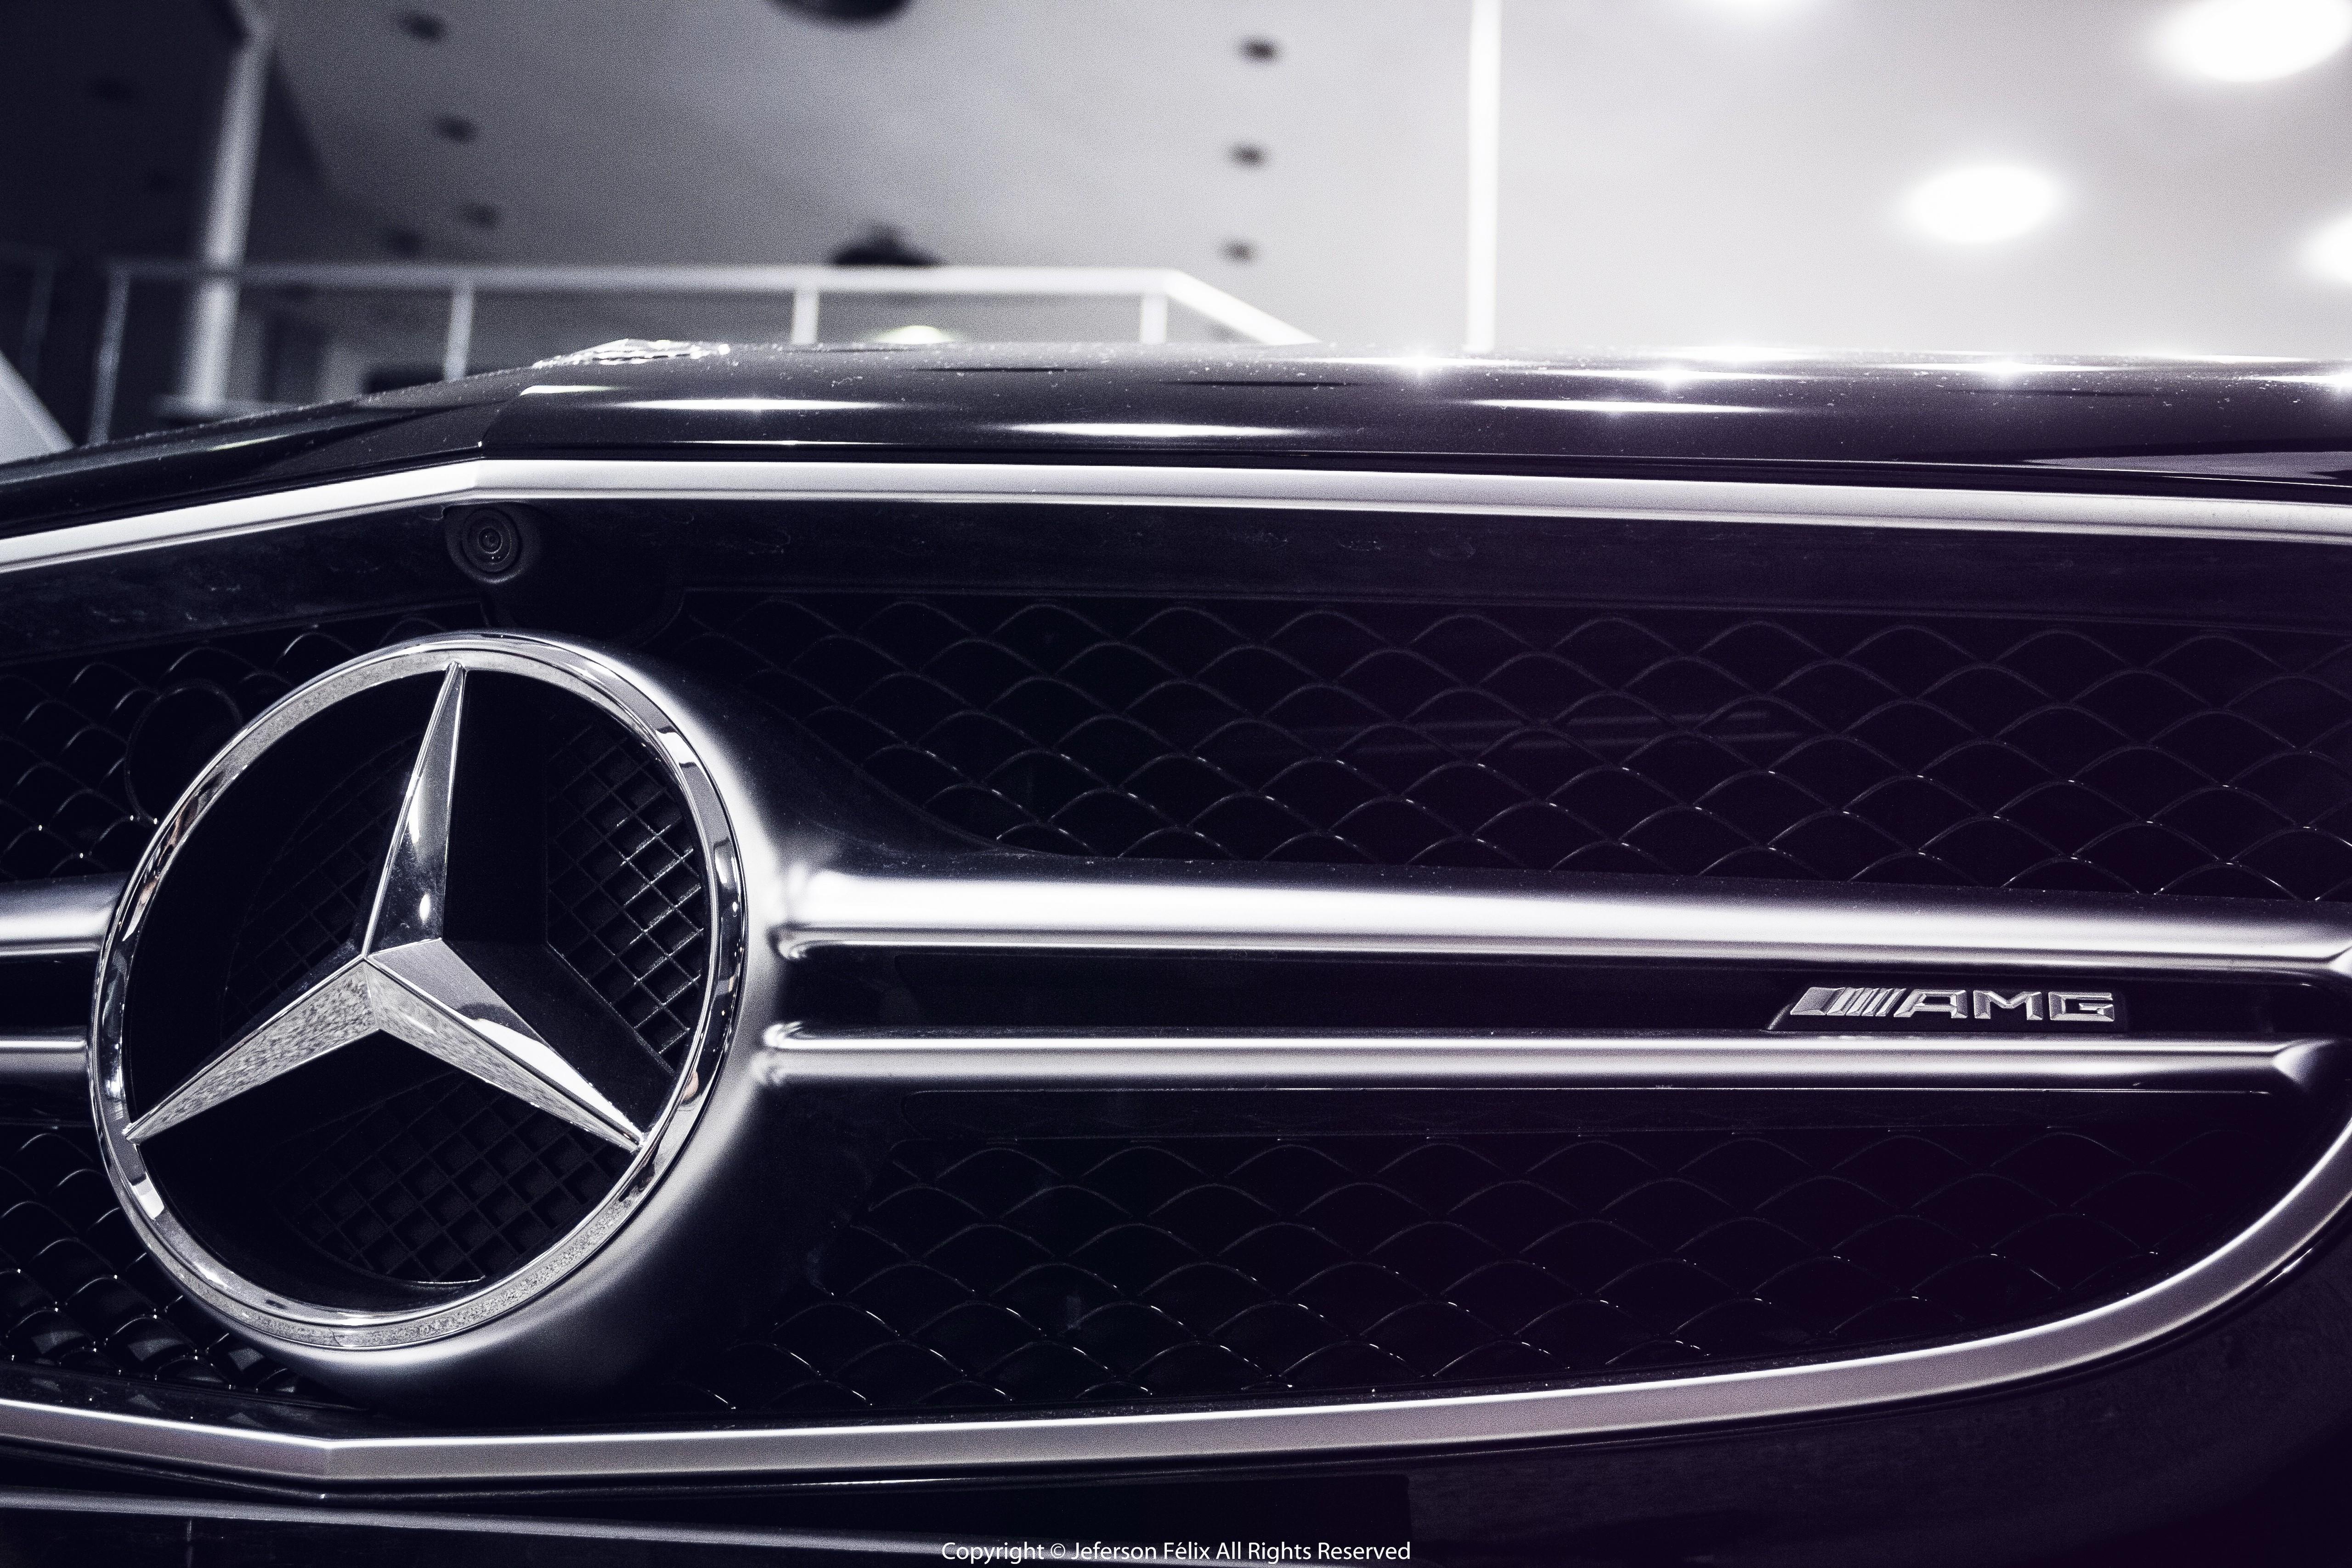 Fond D Ecran Mercedes Benz Voiture De Sport Voiture Performante